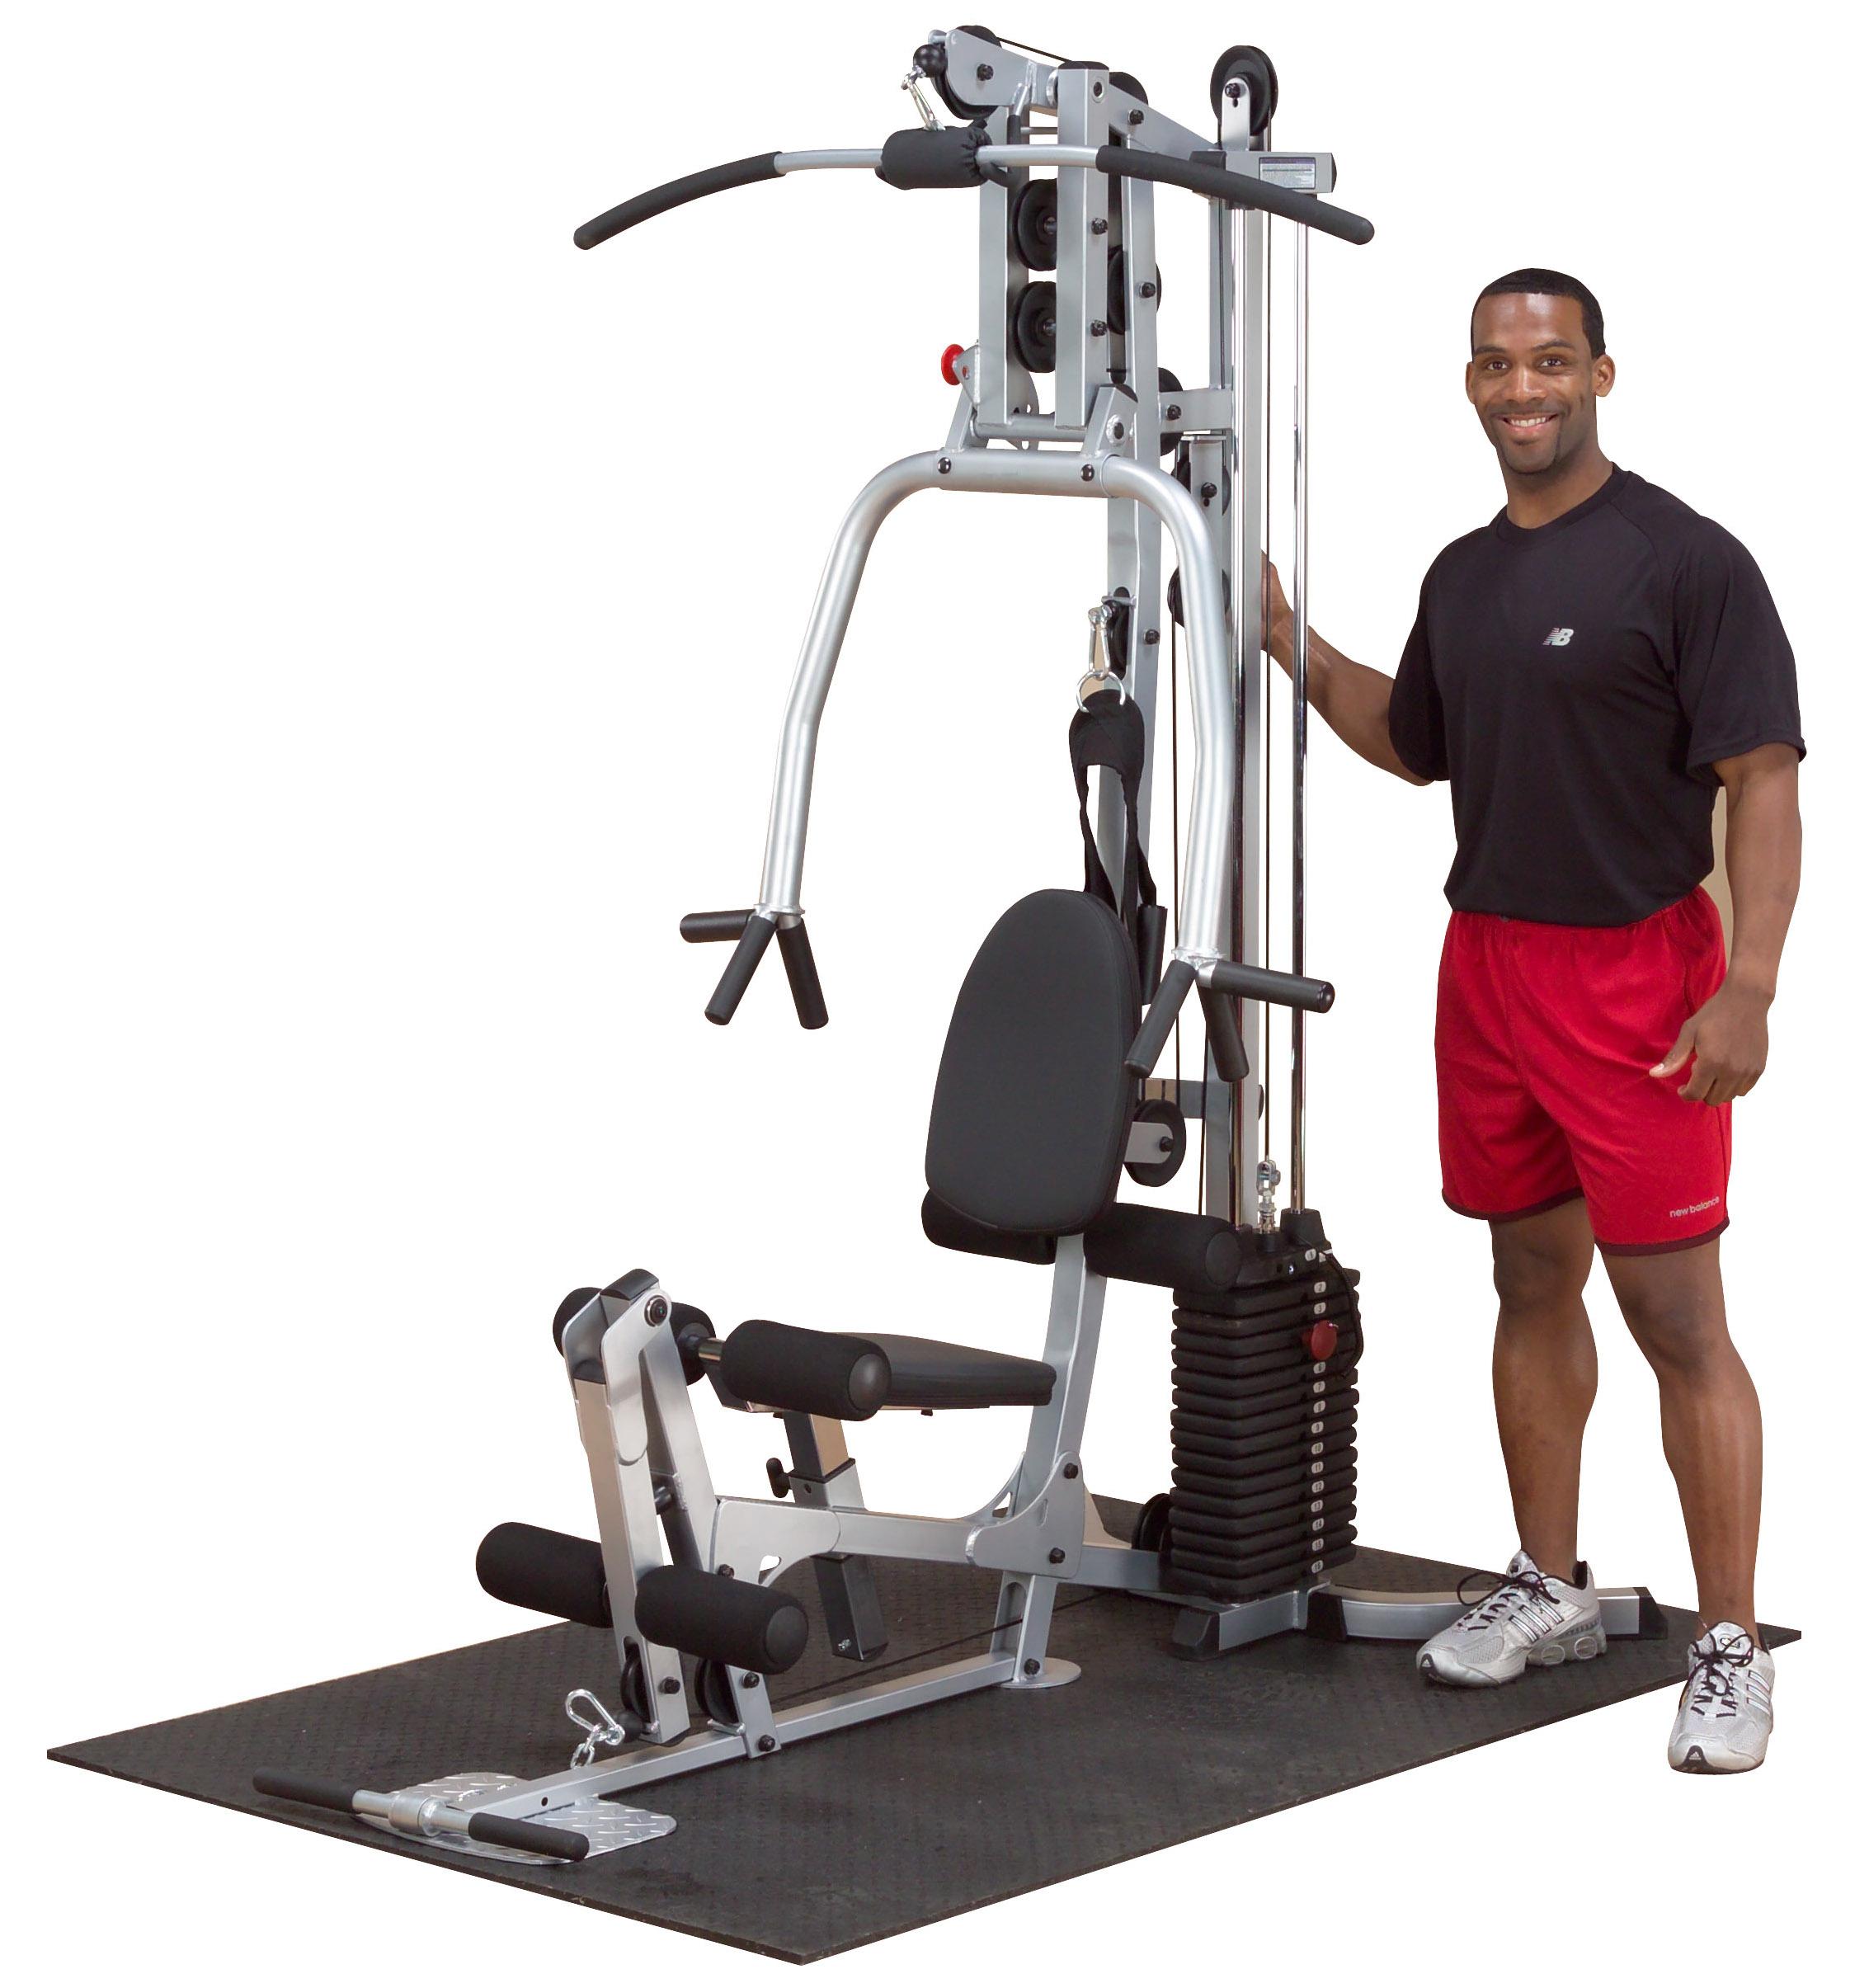 Body Solid Powerline BSG10X Home Gym 0 0 Body Solid Powerline BSG10X   INSIDE Delivery! Home Gym